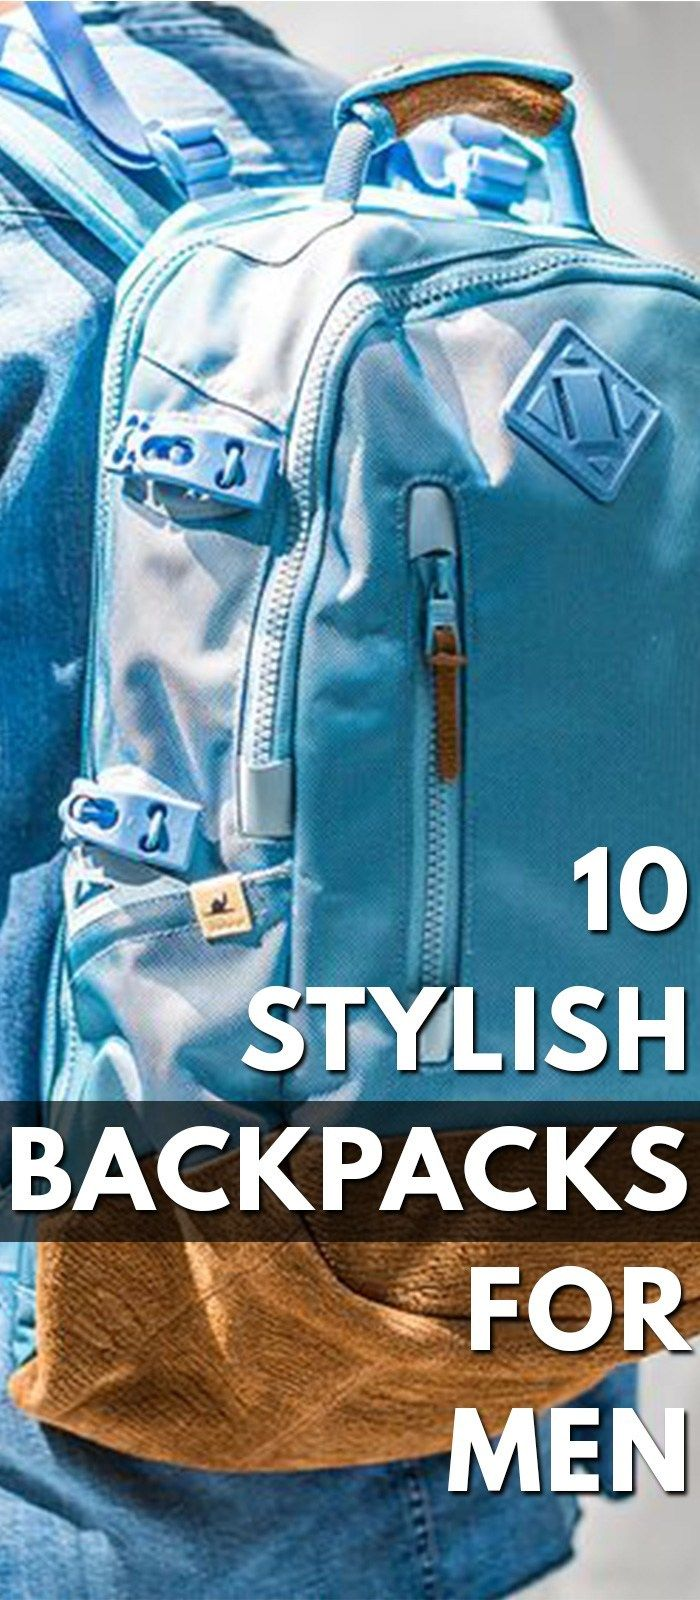 Top 10 Best Backpacks for Men